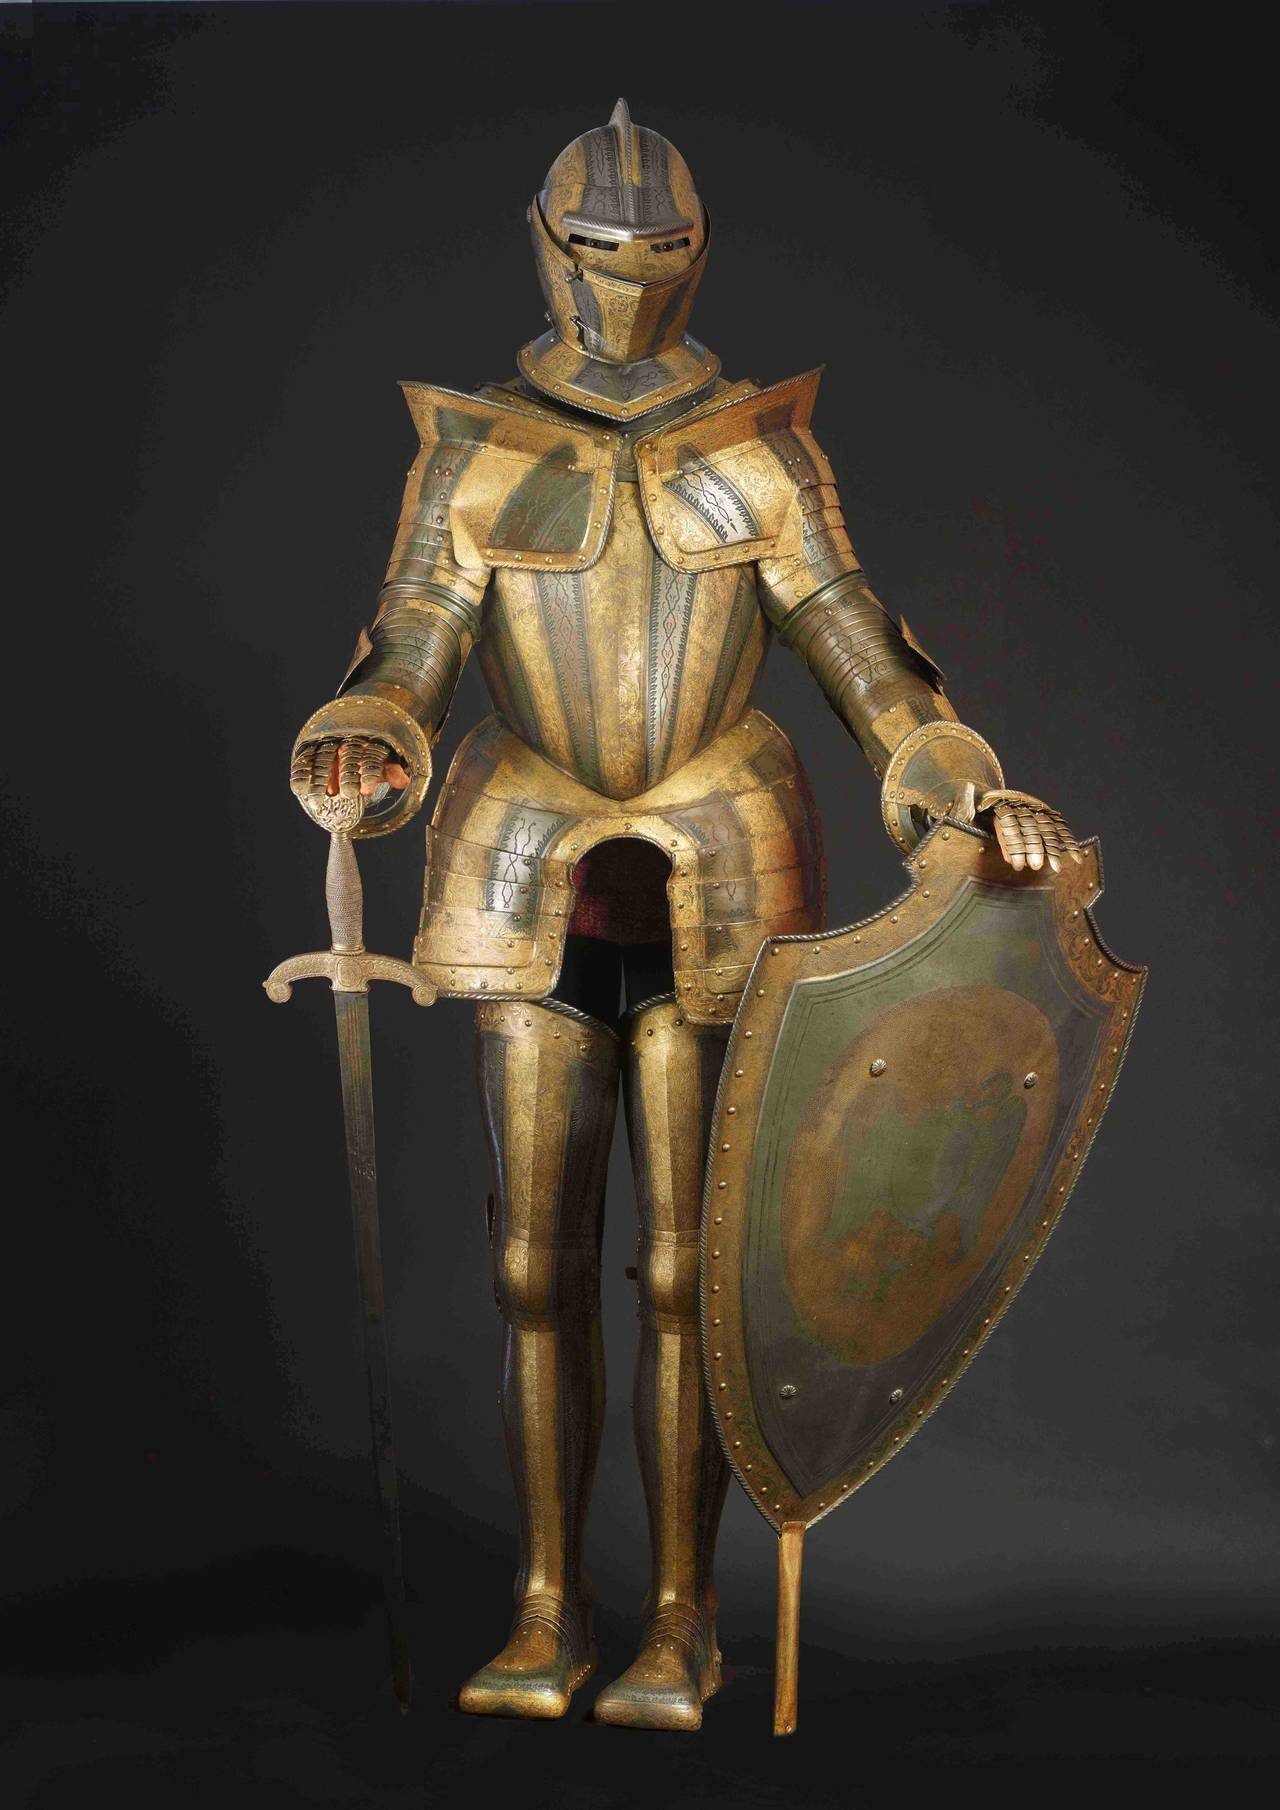 Metal Suit z Metal Suit of Armour Image